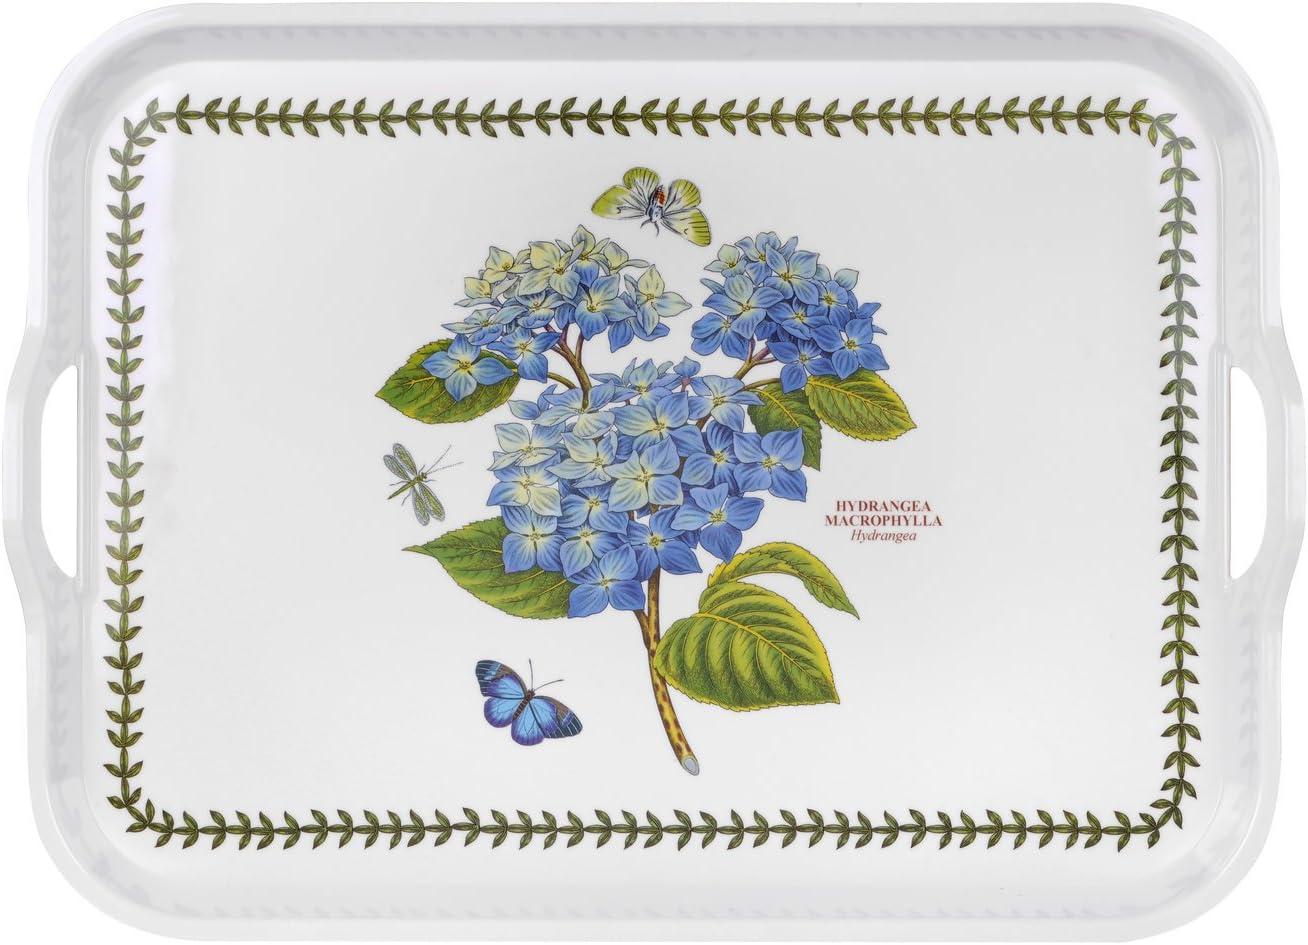 Portmerion Botanic Garden Hydrangea Handled Serving Tray 52cm by 38cm